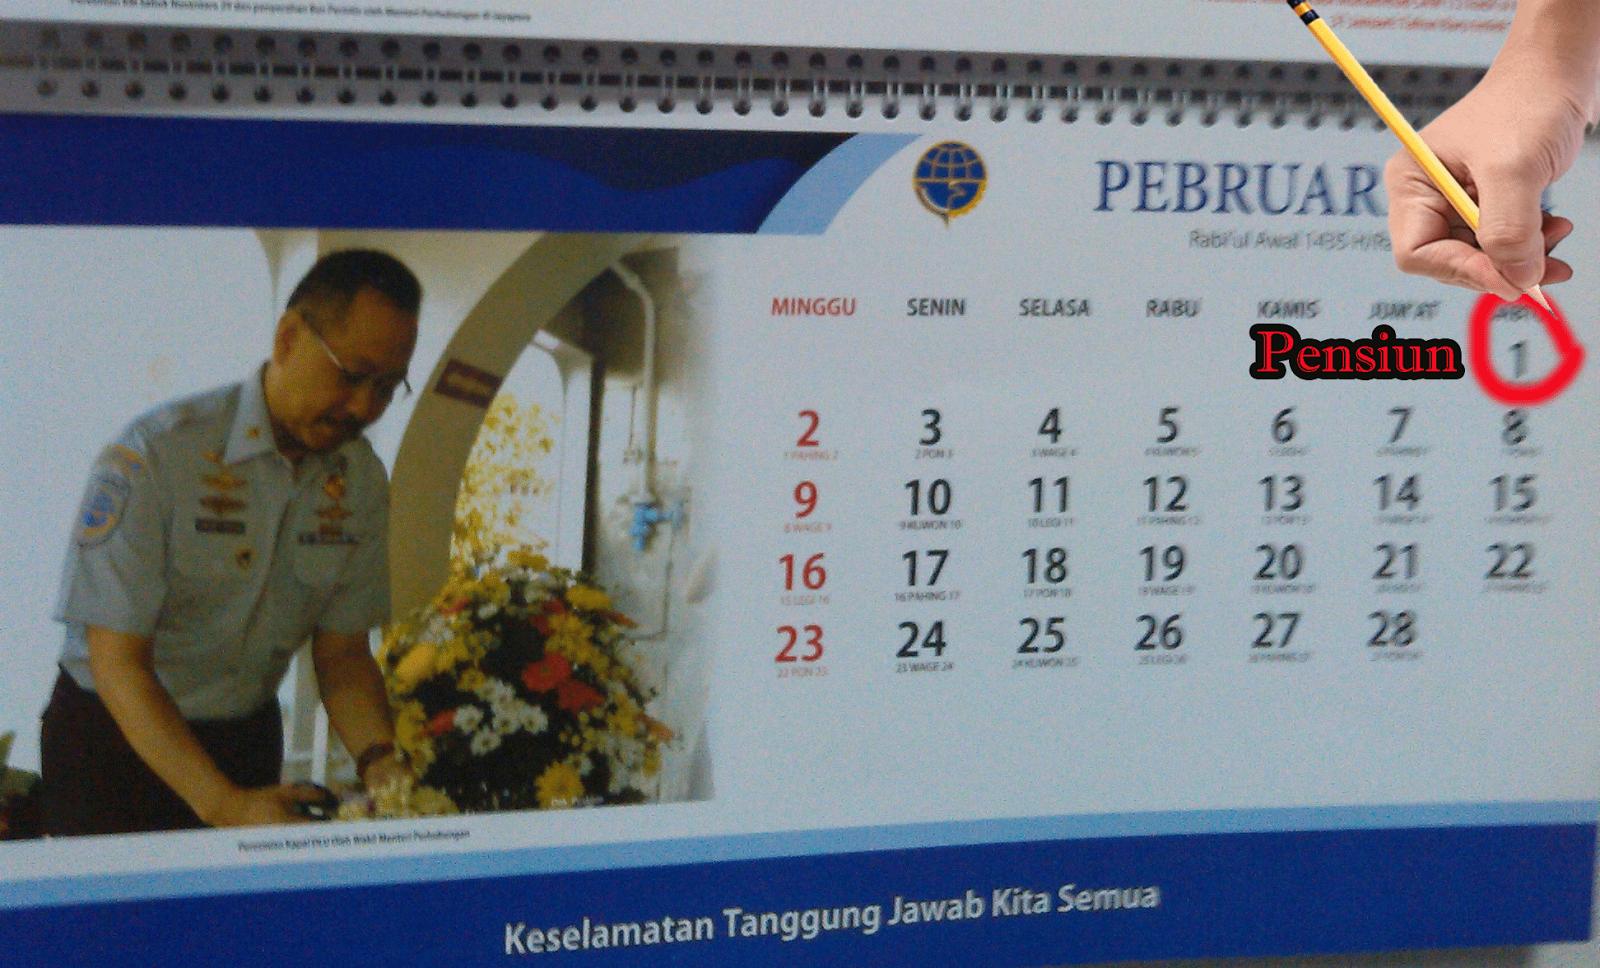 Pengumuman Cpns Pekanbaru 2013 Pengumuman Pendaftaran Bintara Pk Tni Ad Agustus 2016 Pengumuman Cpns 2013 Mulai Bulan Februari 2014 Pensiun Pns